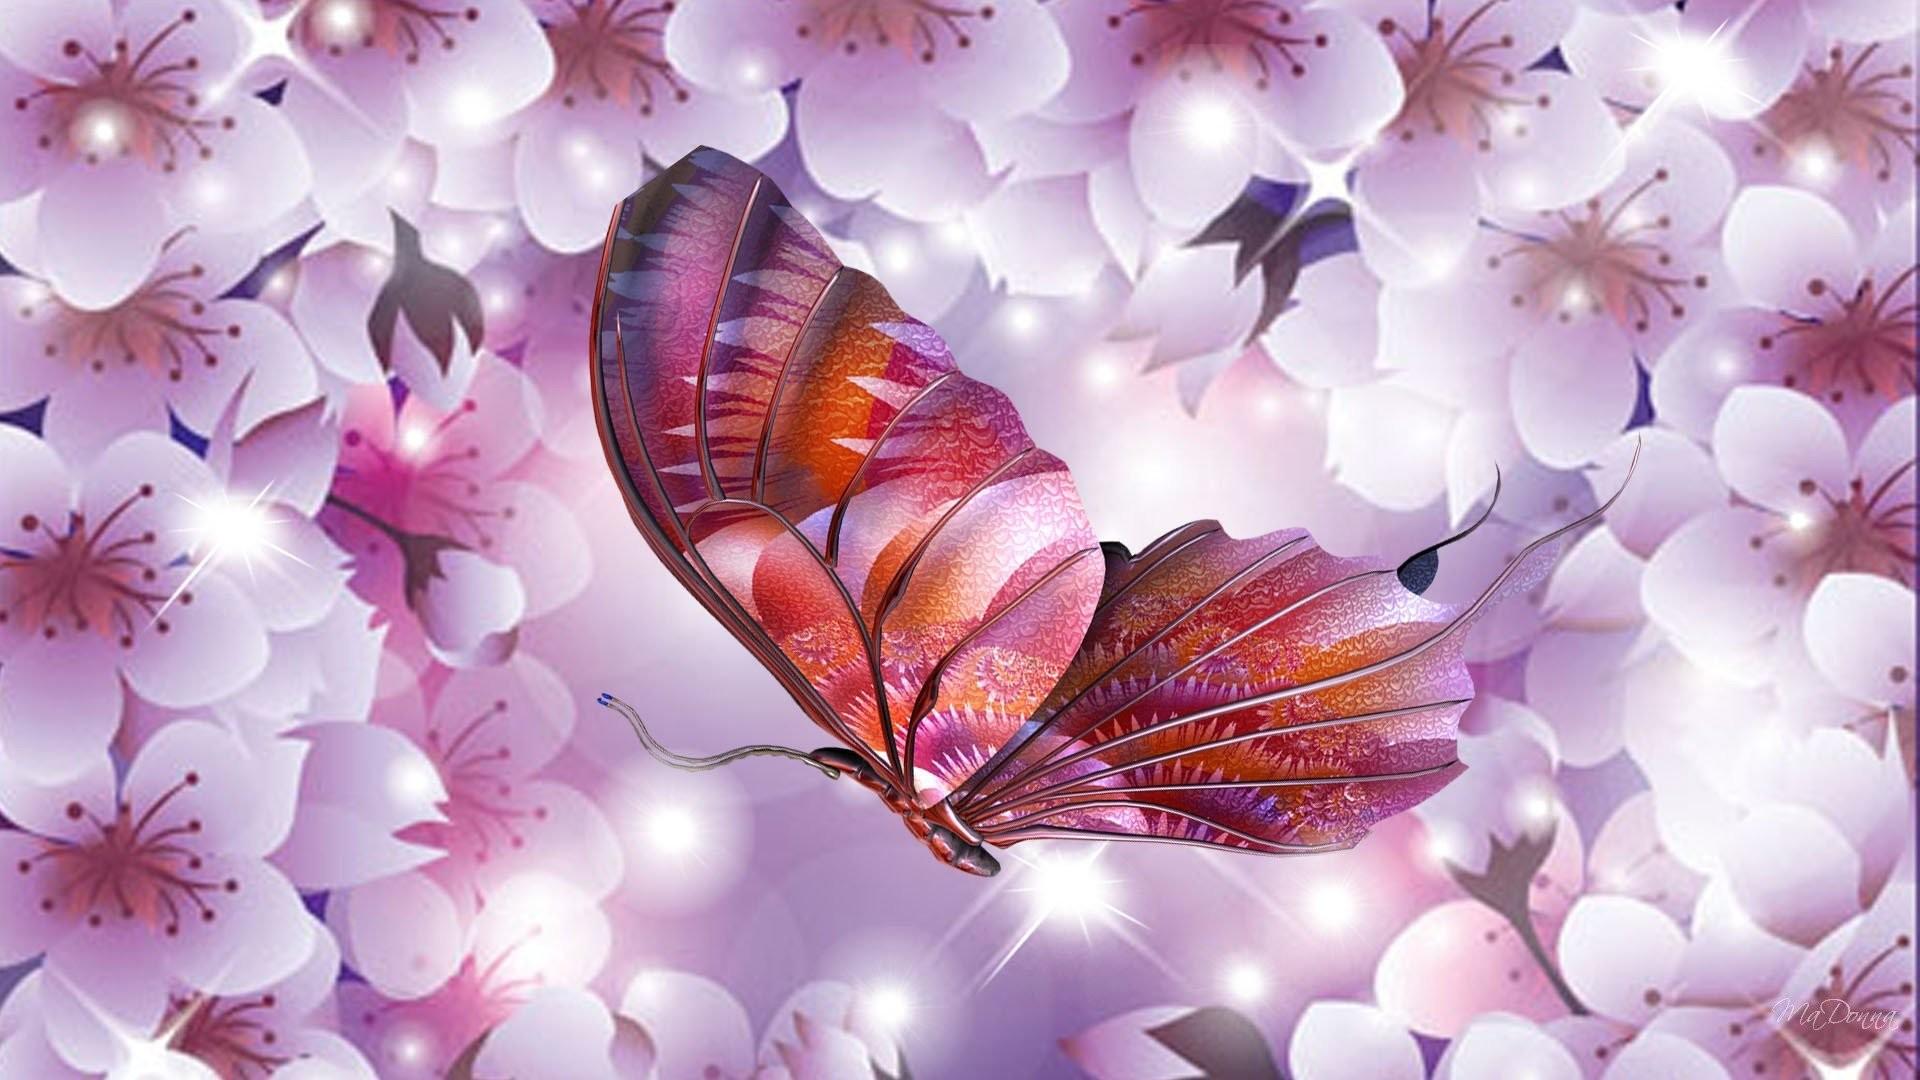 Cherry Blossom Desktop Wallpapers Wallpaper